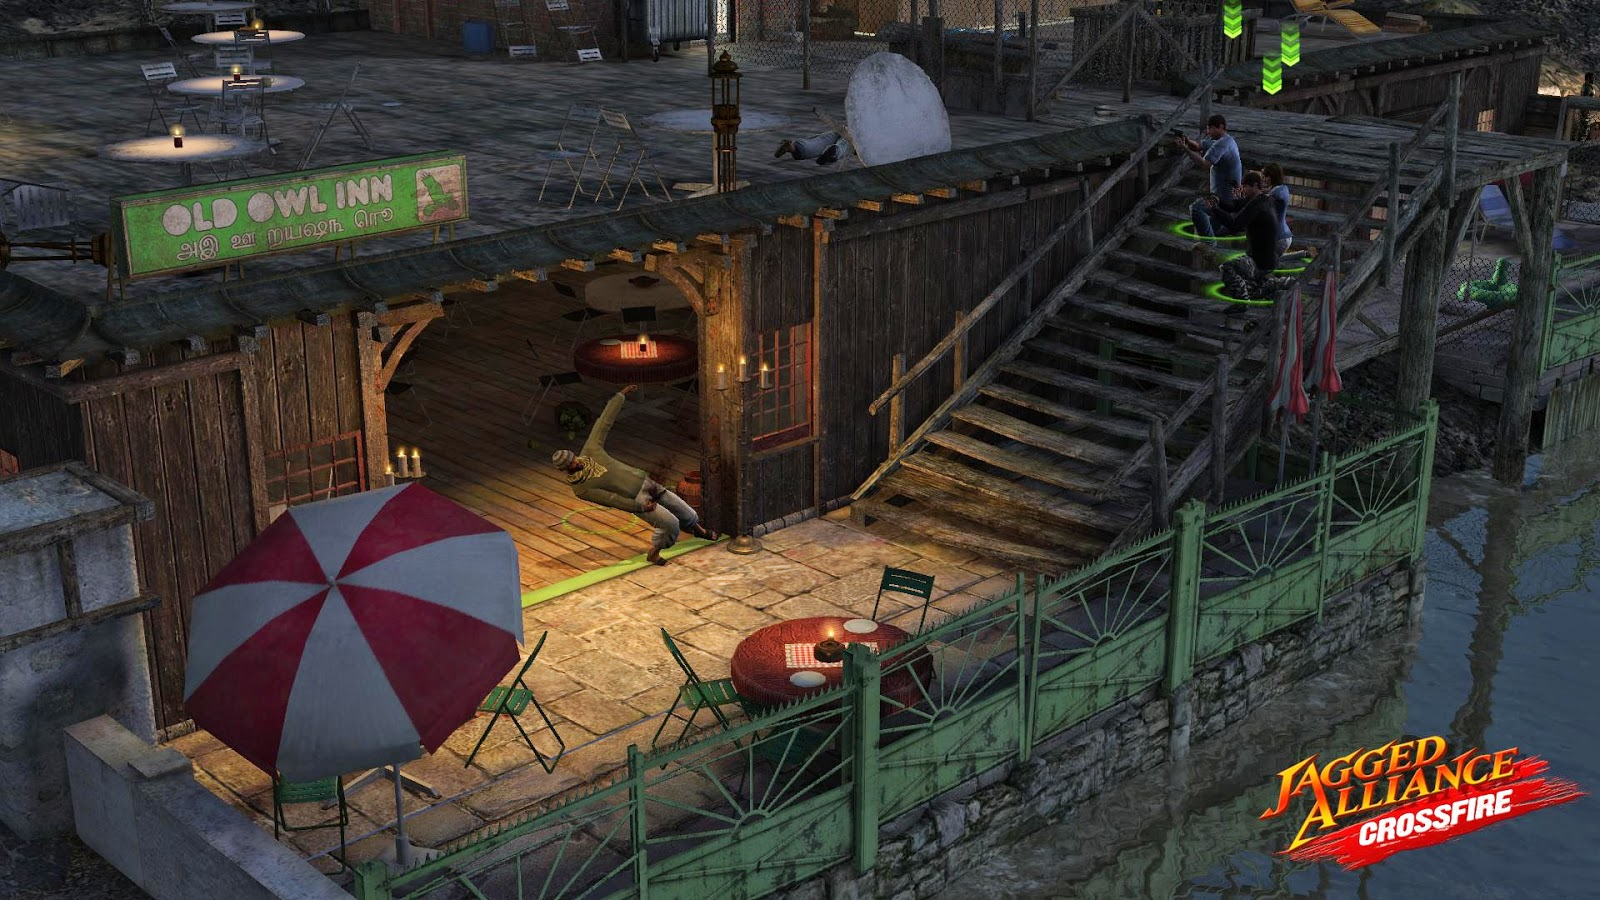 Jagged Alliance CrossFire Game ScreenShots:-